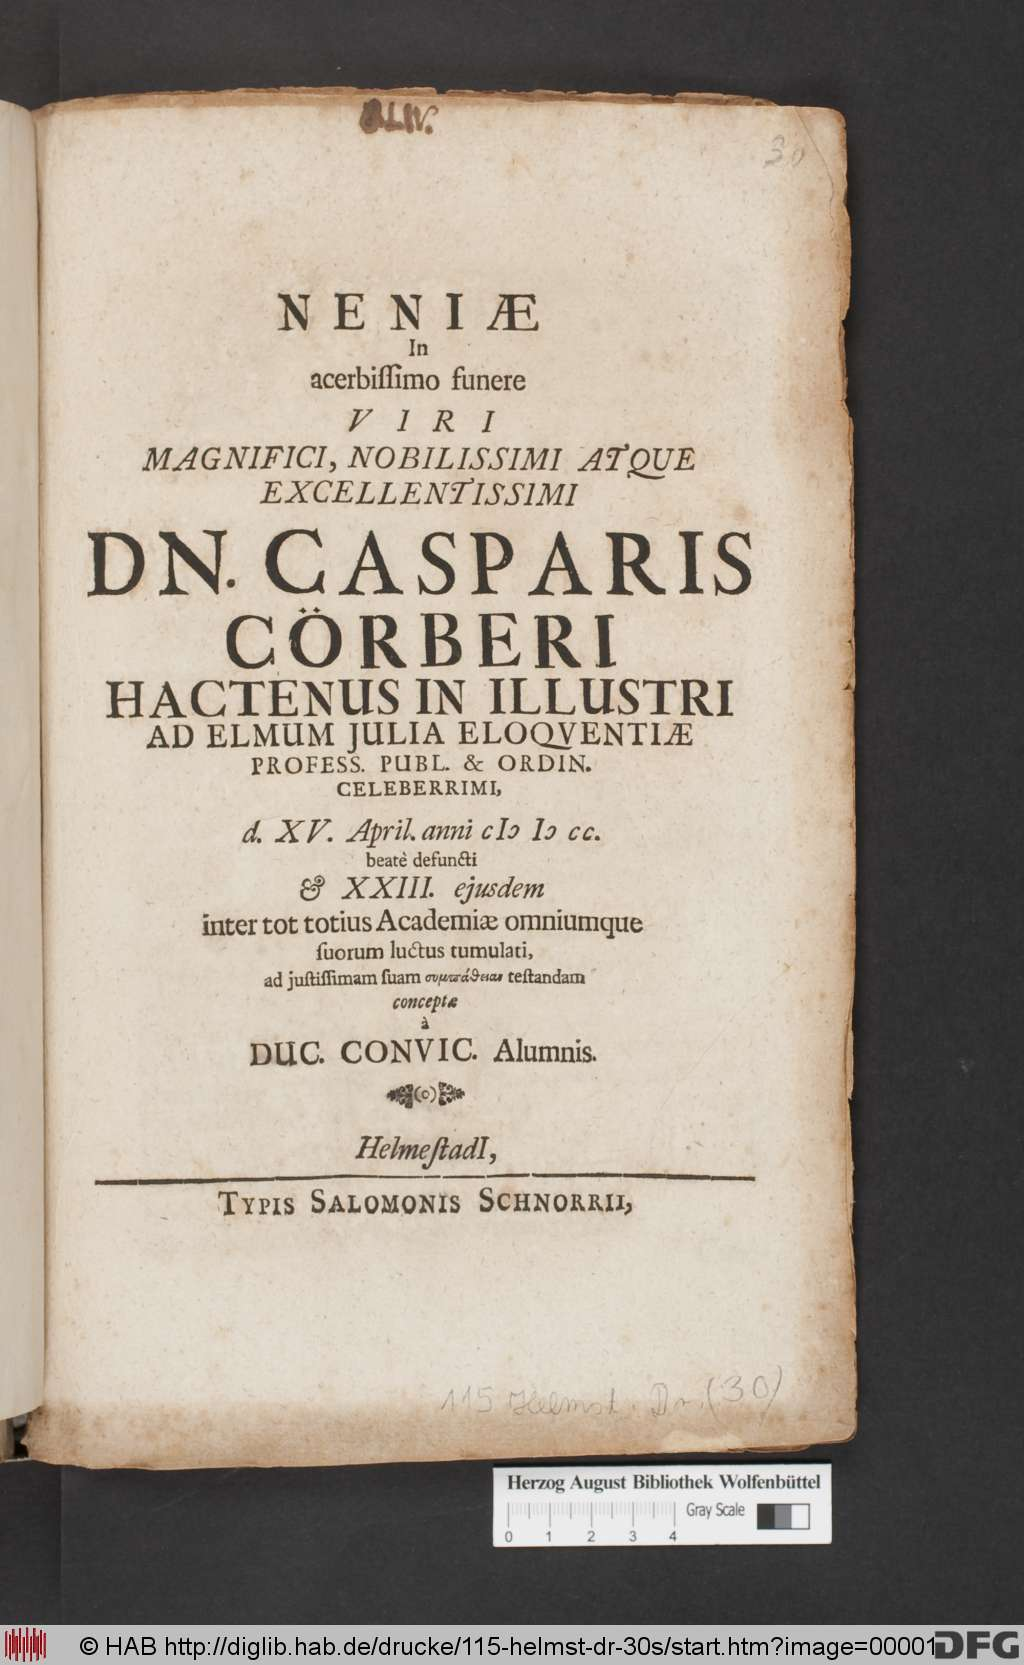 https://diglib.hab.de/drucke/115-helmst-dr-30s/00001.jpg